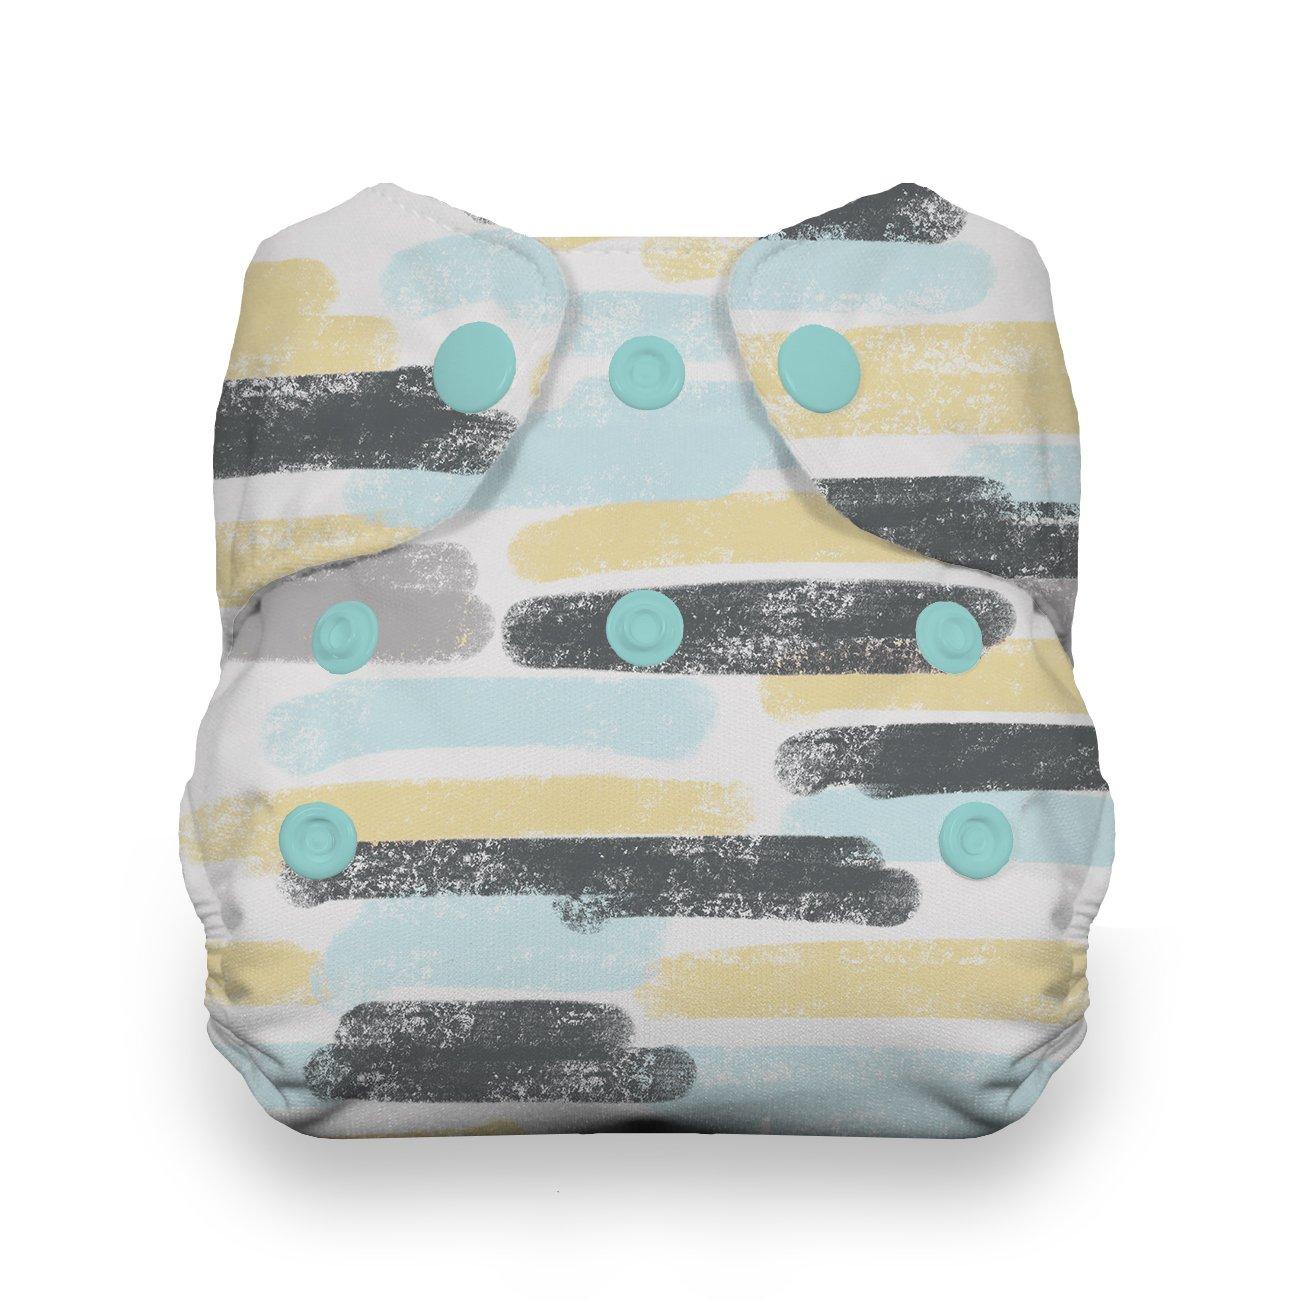 Thirsties Newborn All in One Cloth Diaper, Snap Closure, Dreamscape